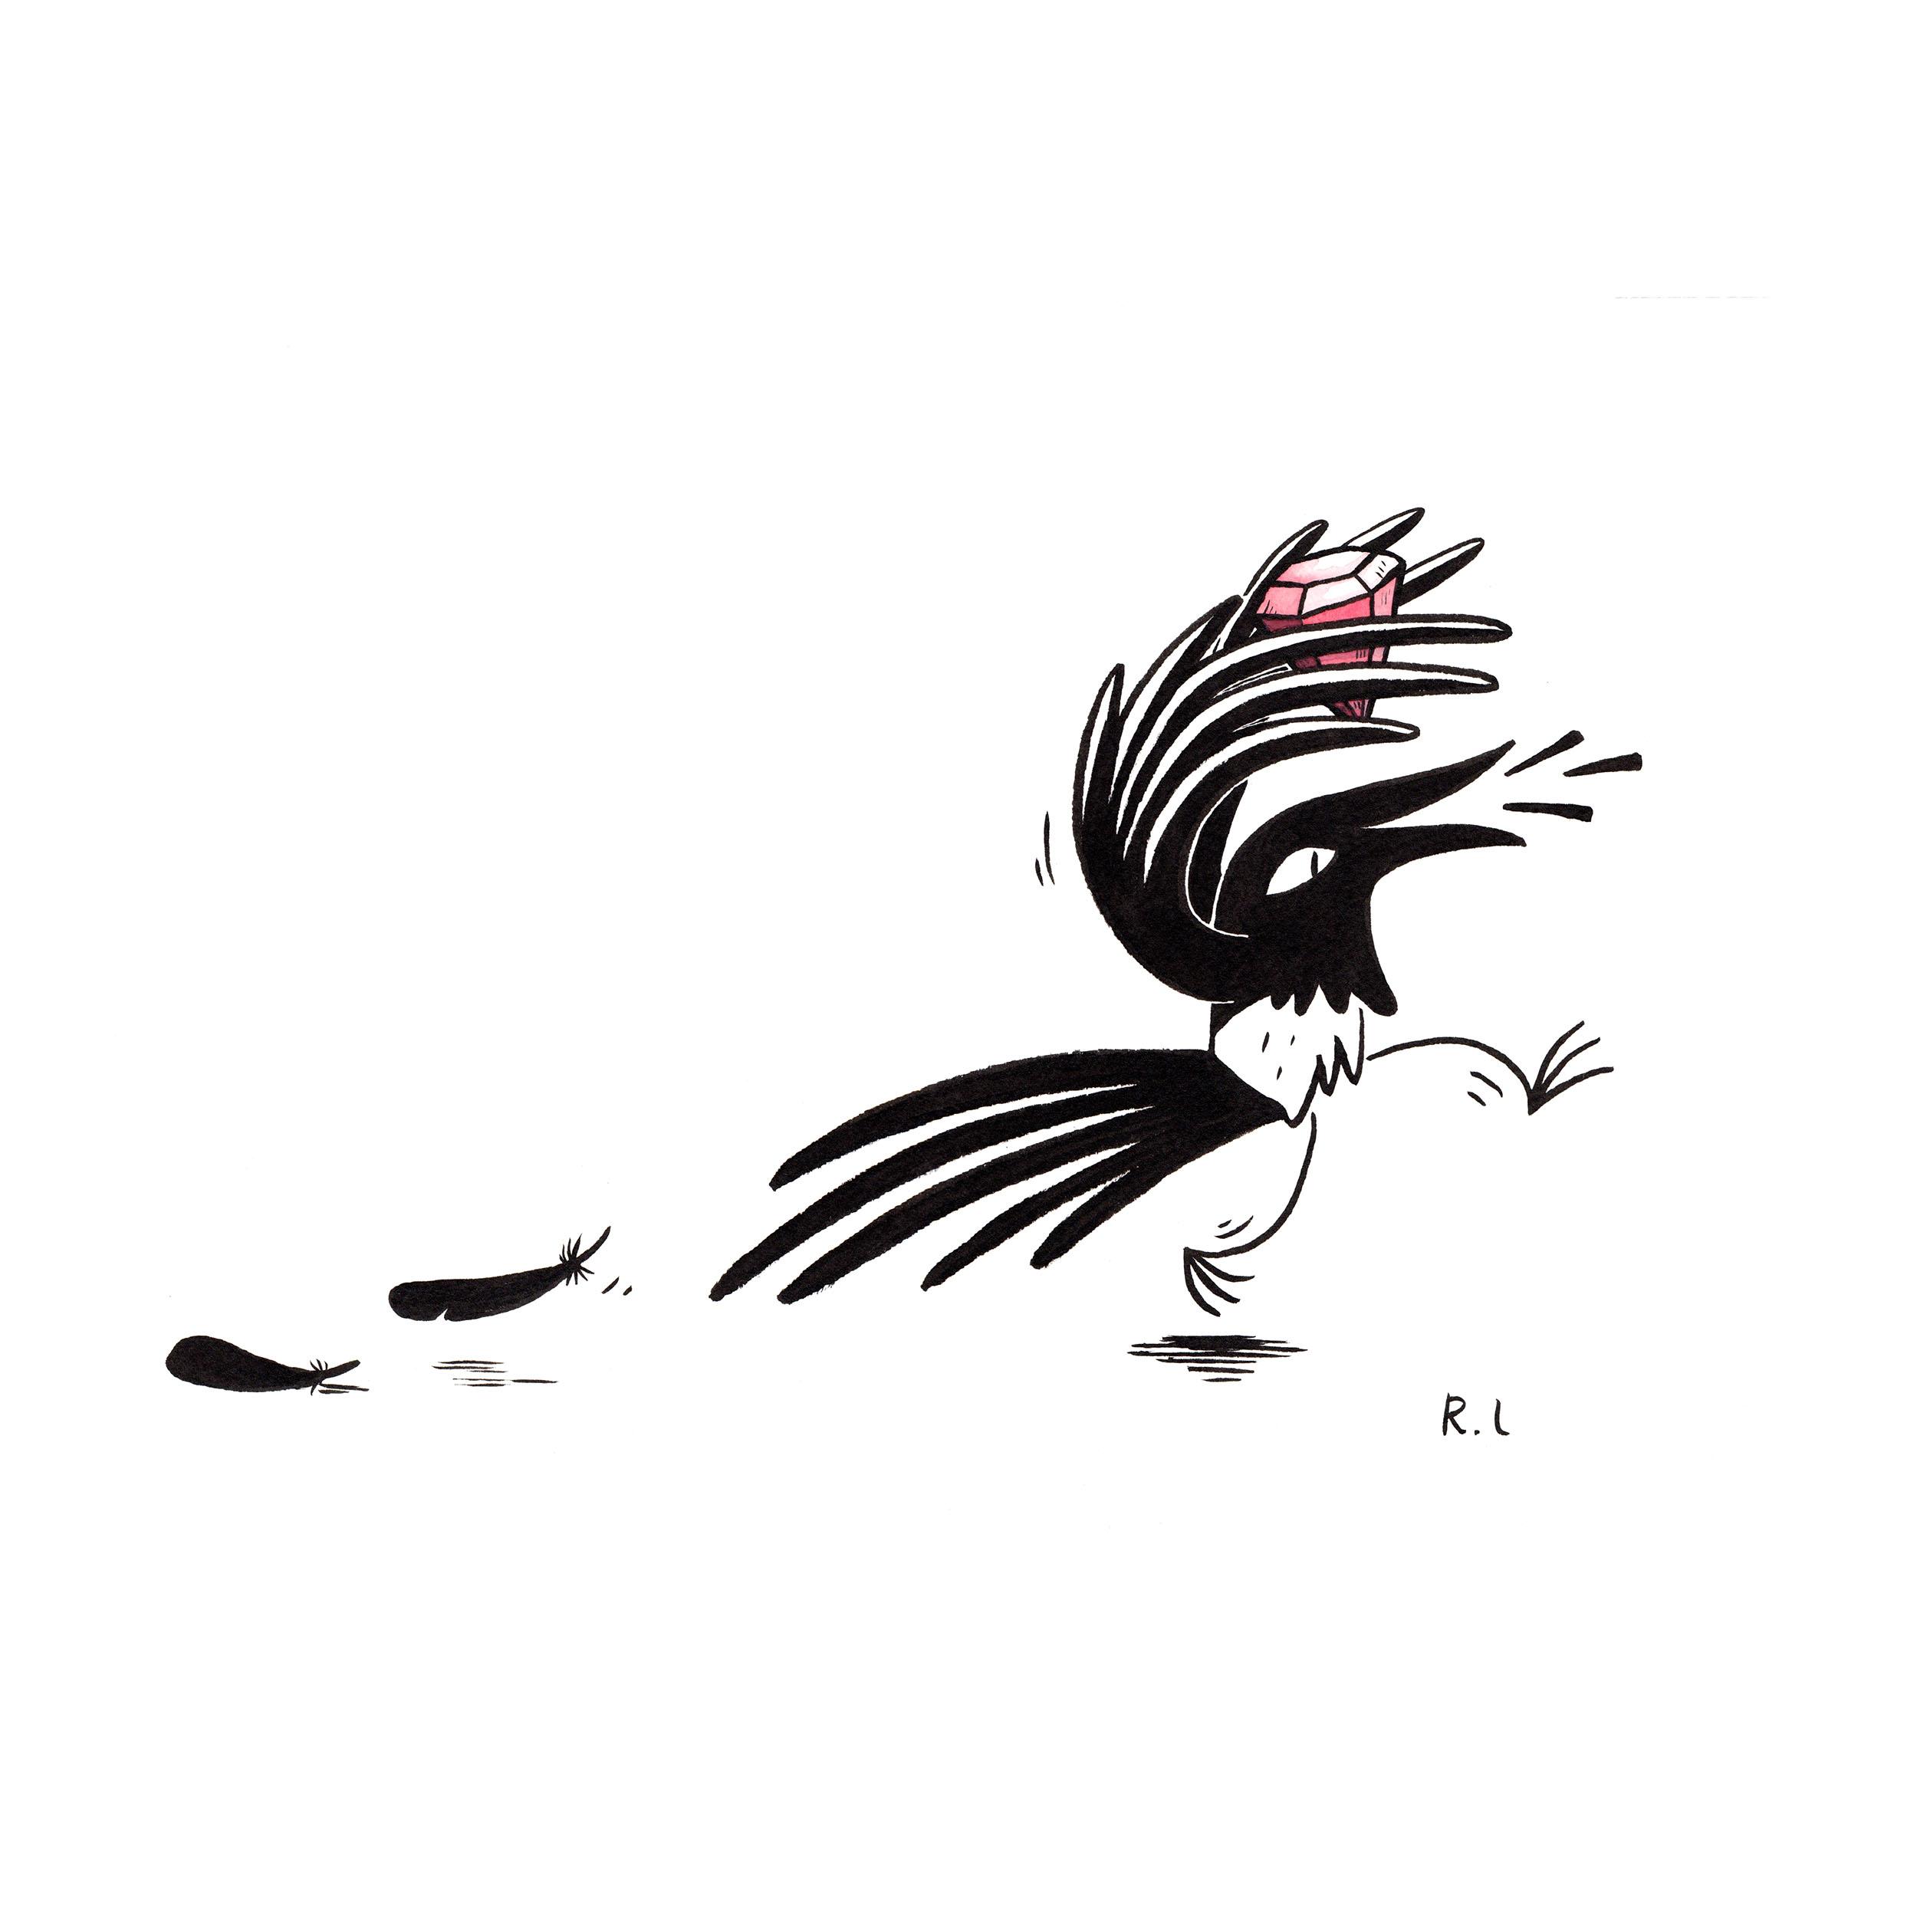 rachel logan illustration magpie steal jewel ruby.jpg